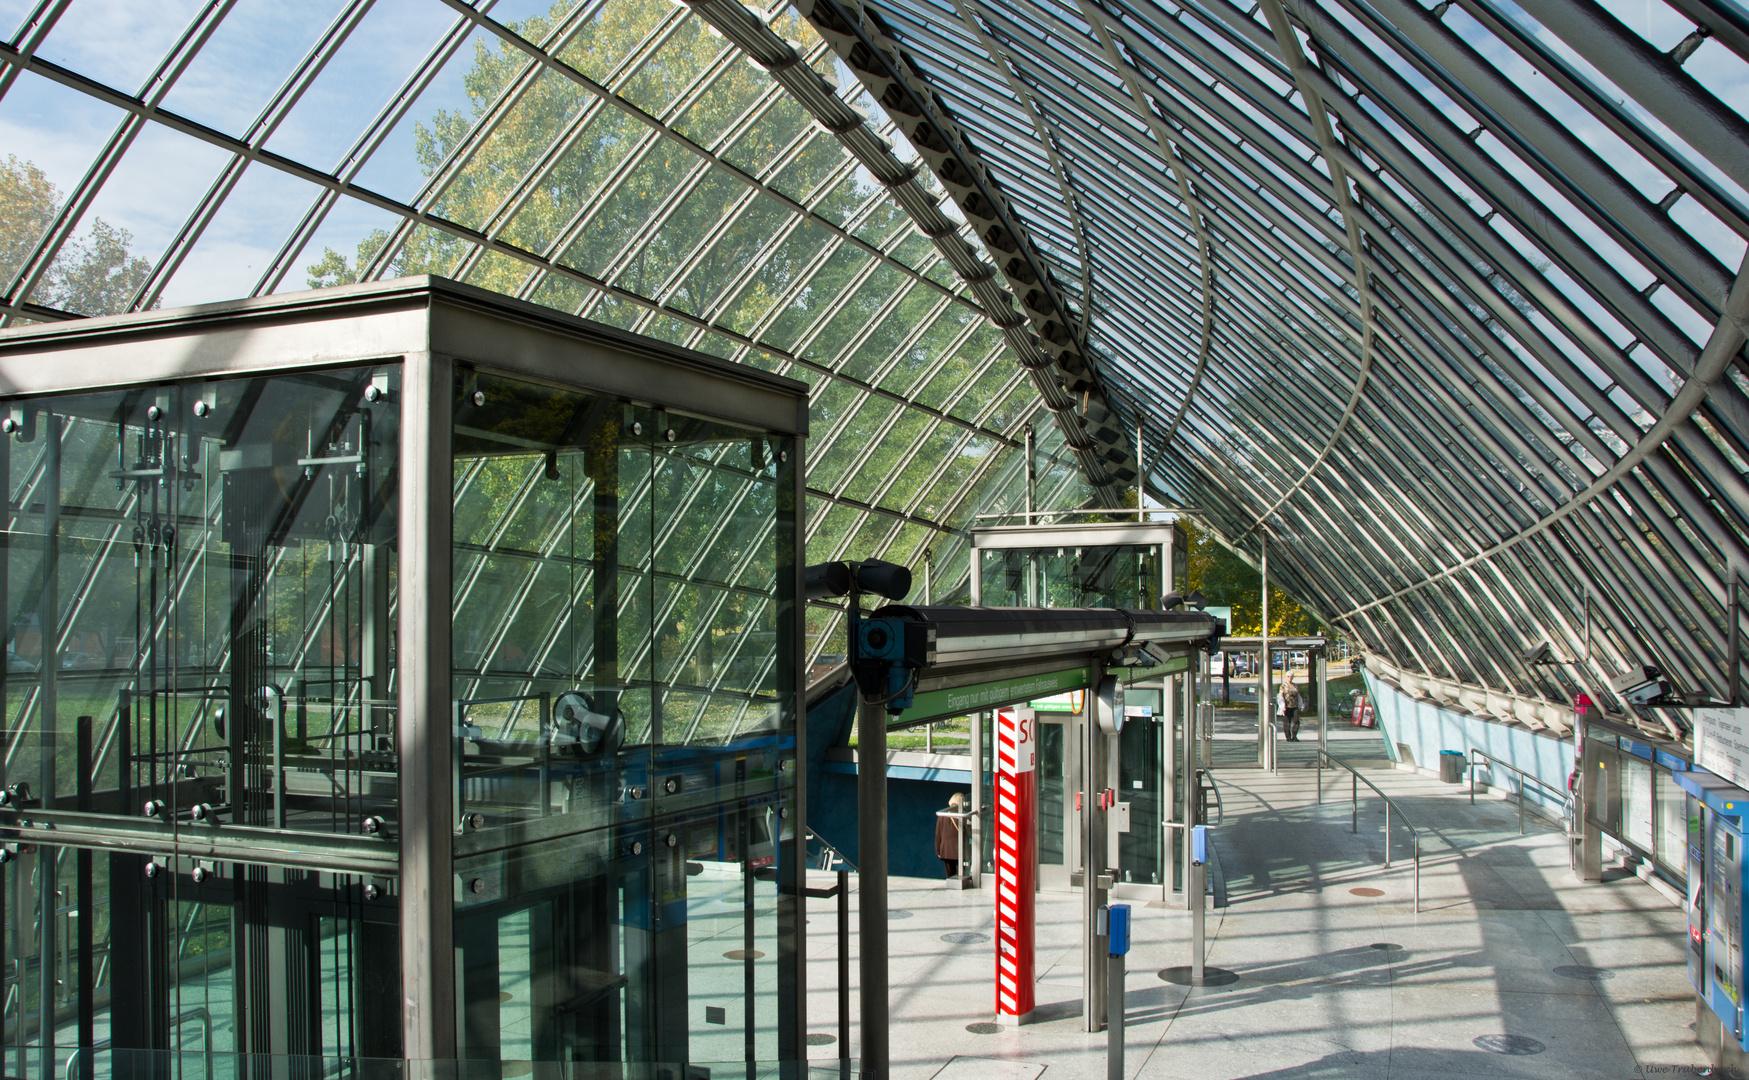 U-Bahnhof St.-Quirin-Platz (2)